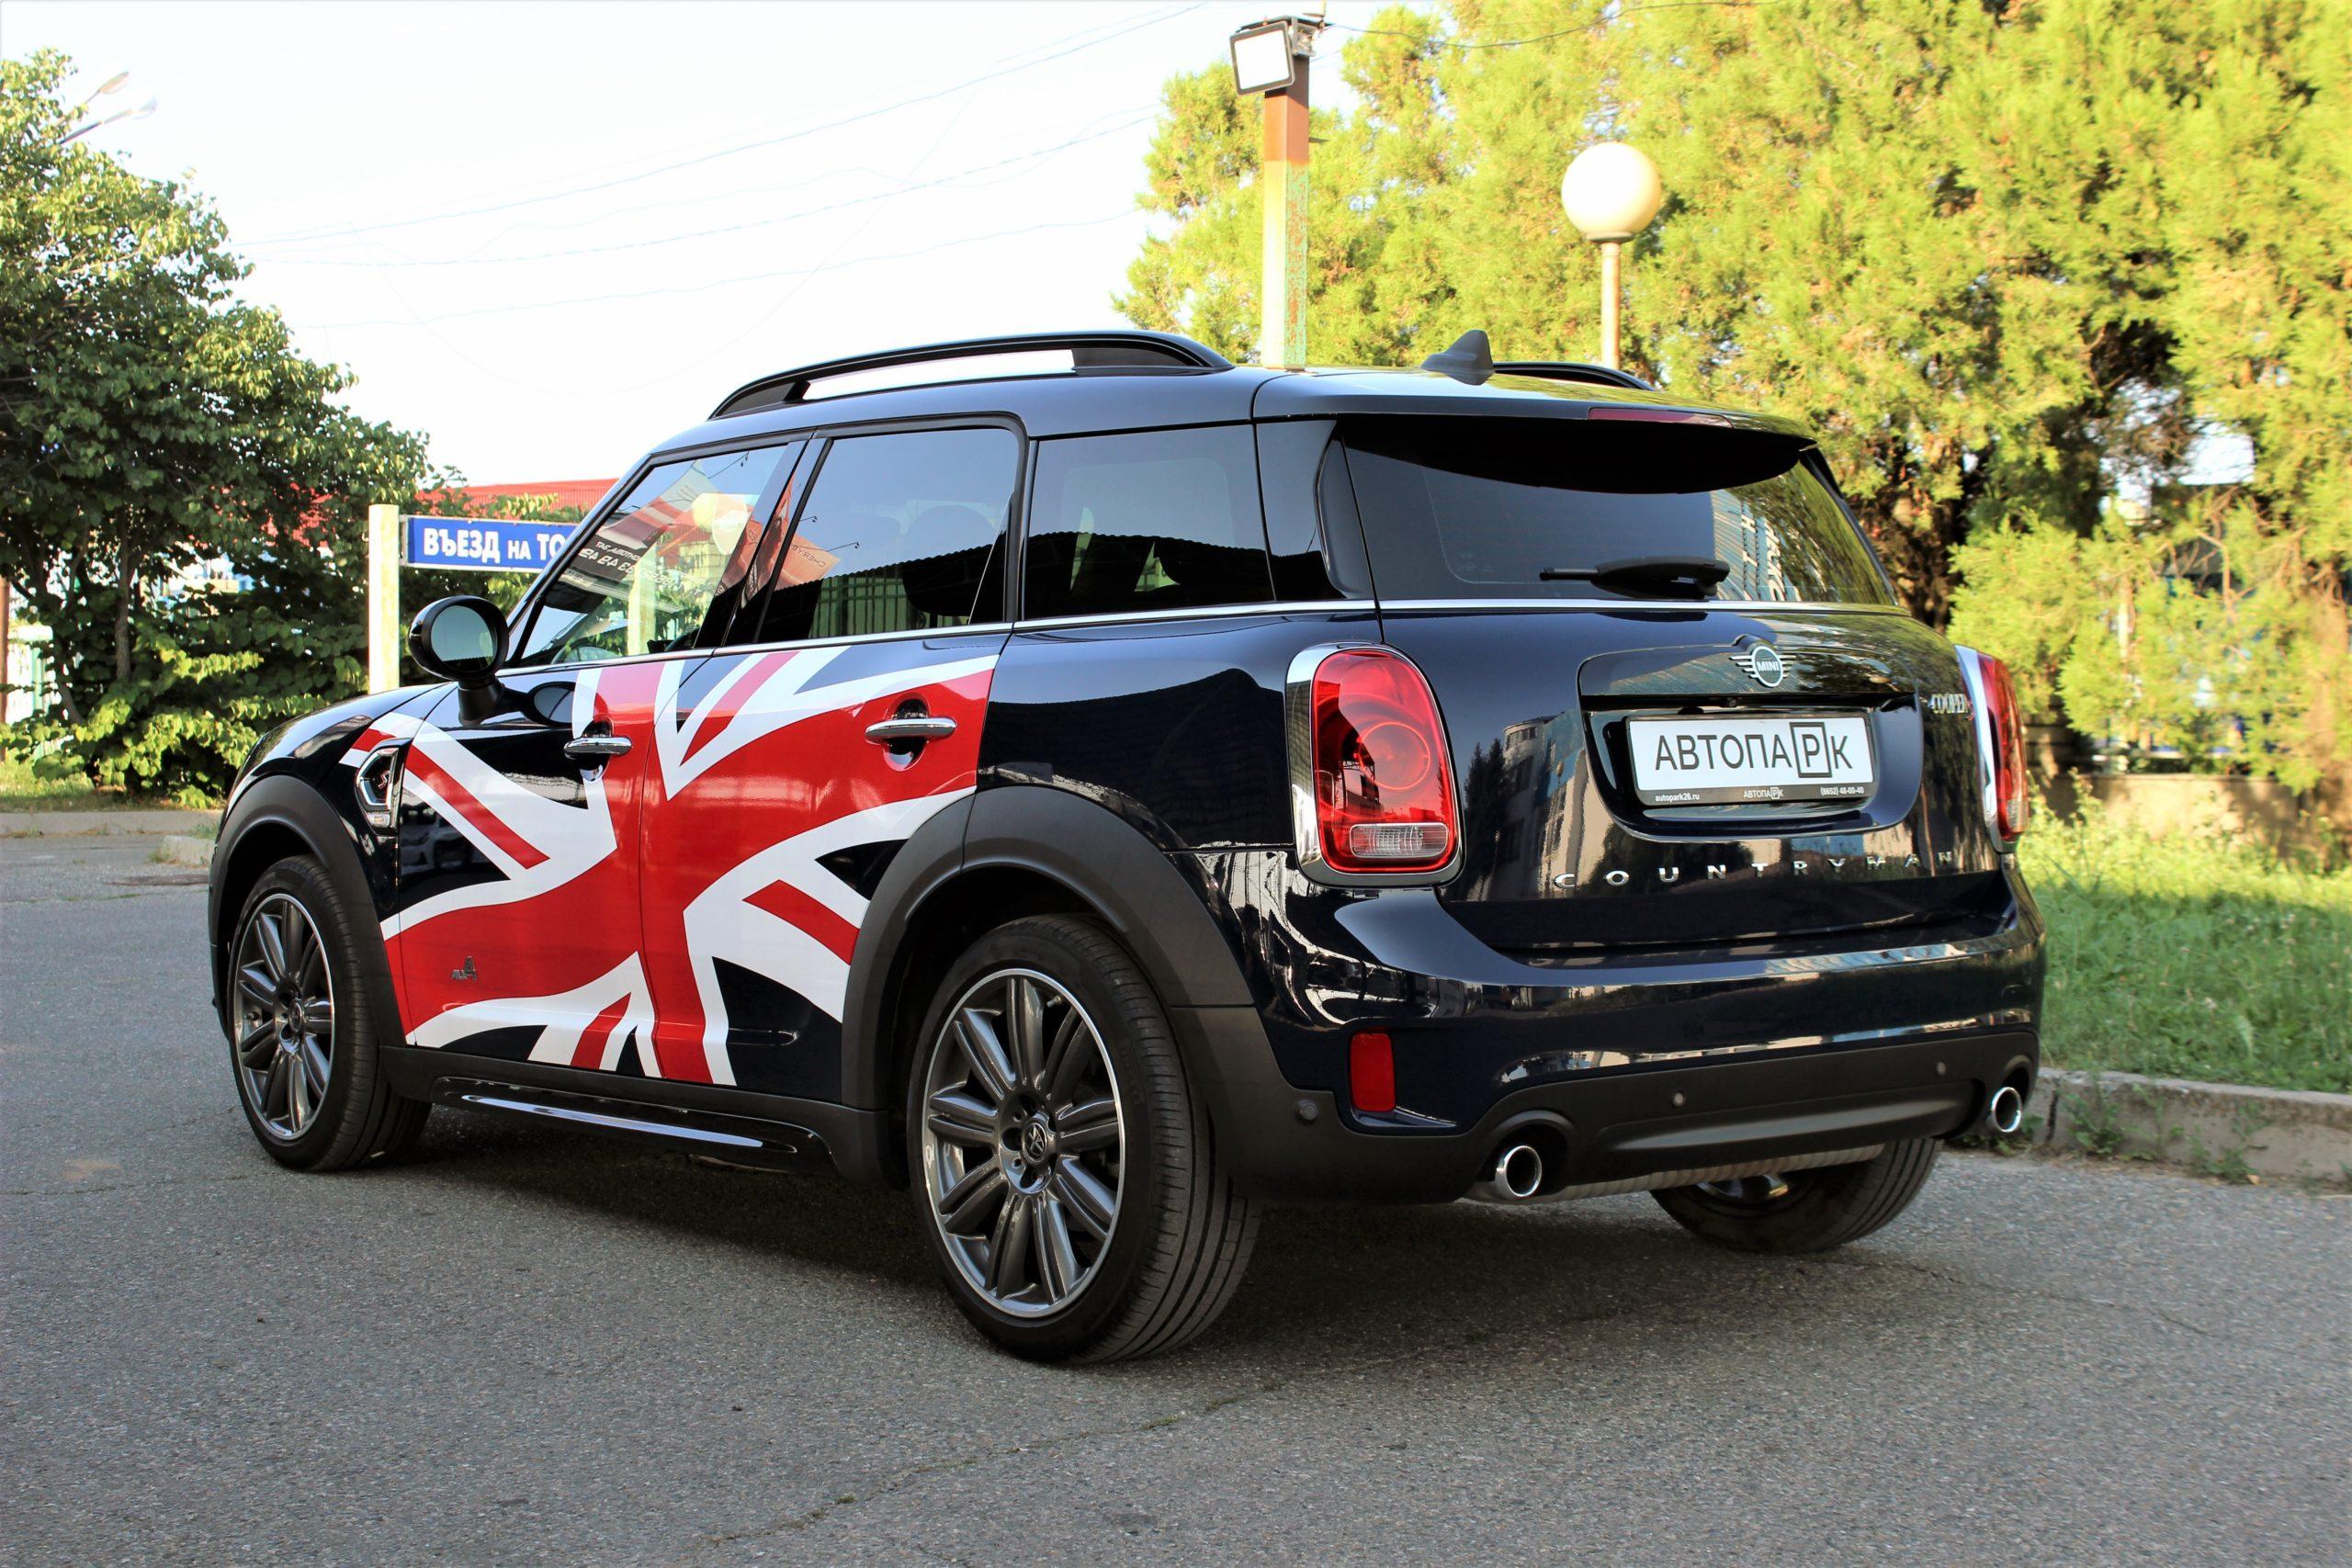 Купить MINI Cooper S Countryman (Синий) - Автопарк Ставрополь